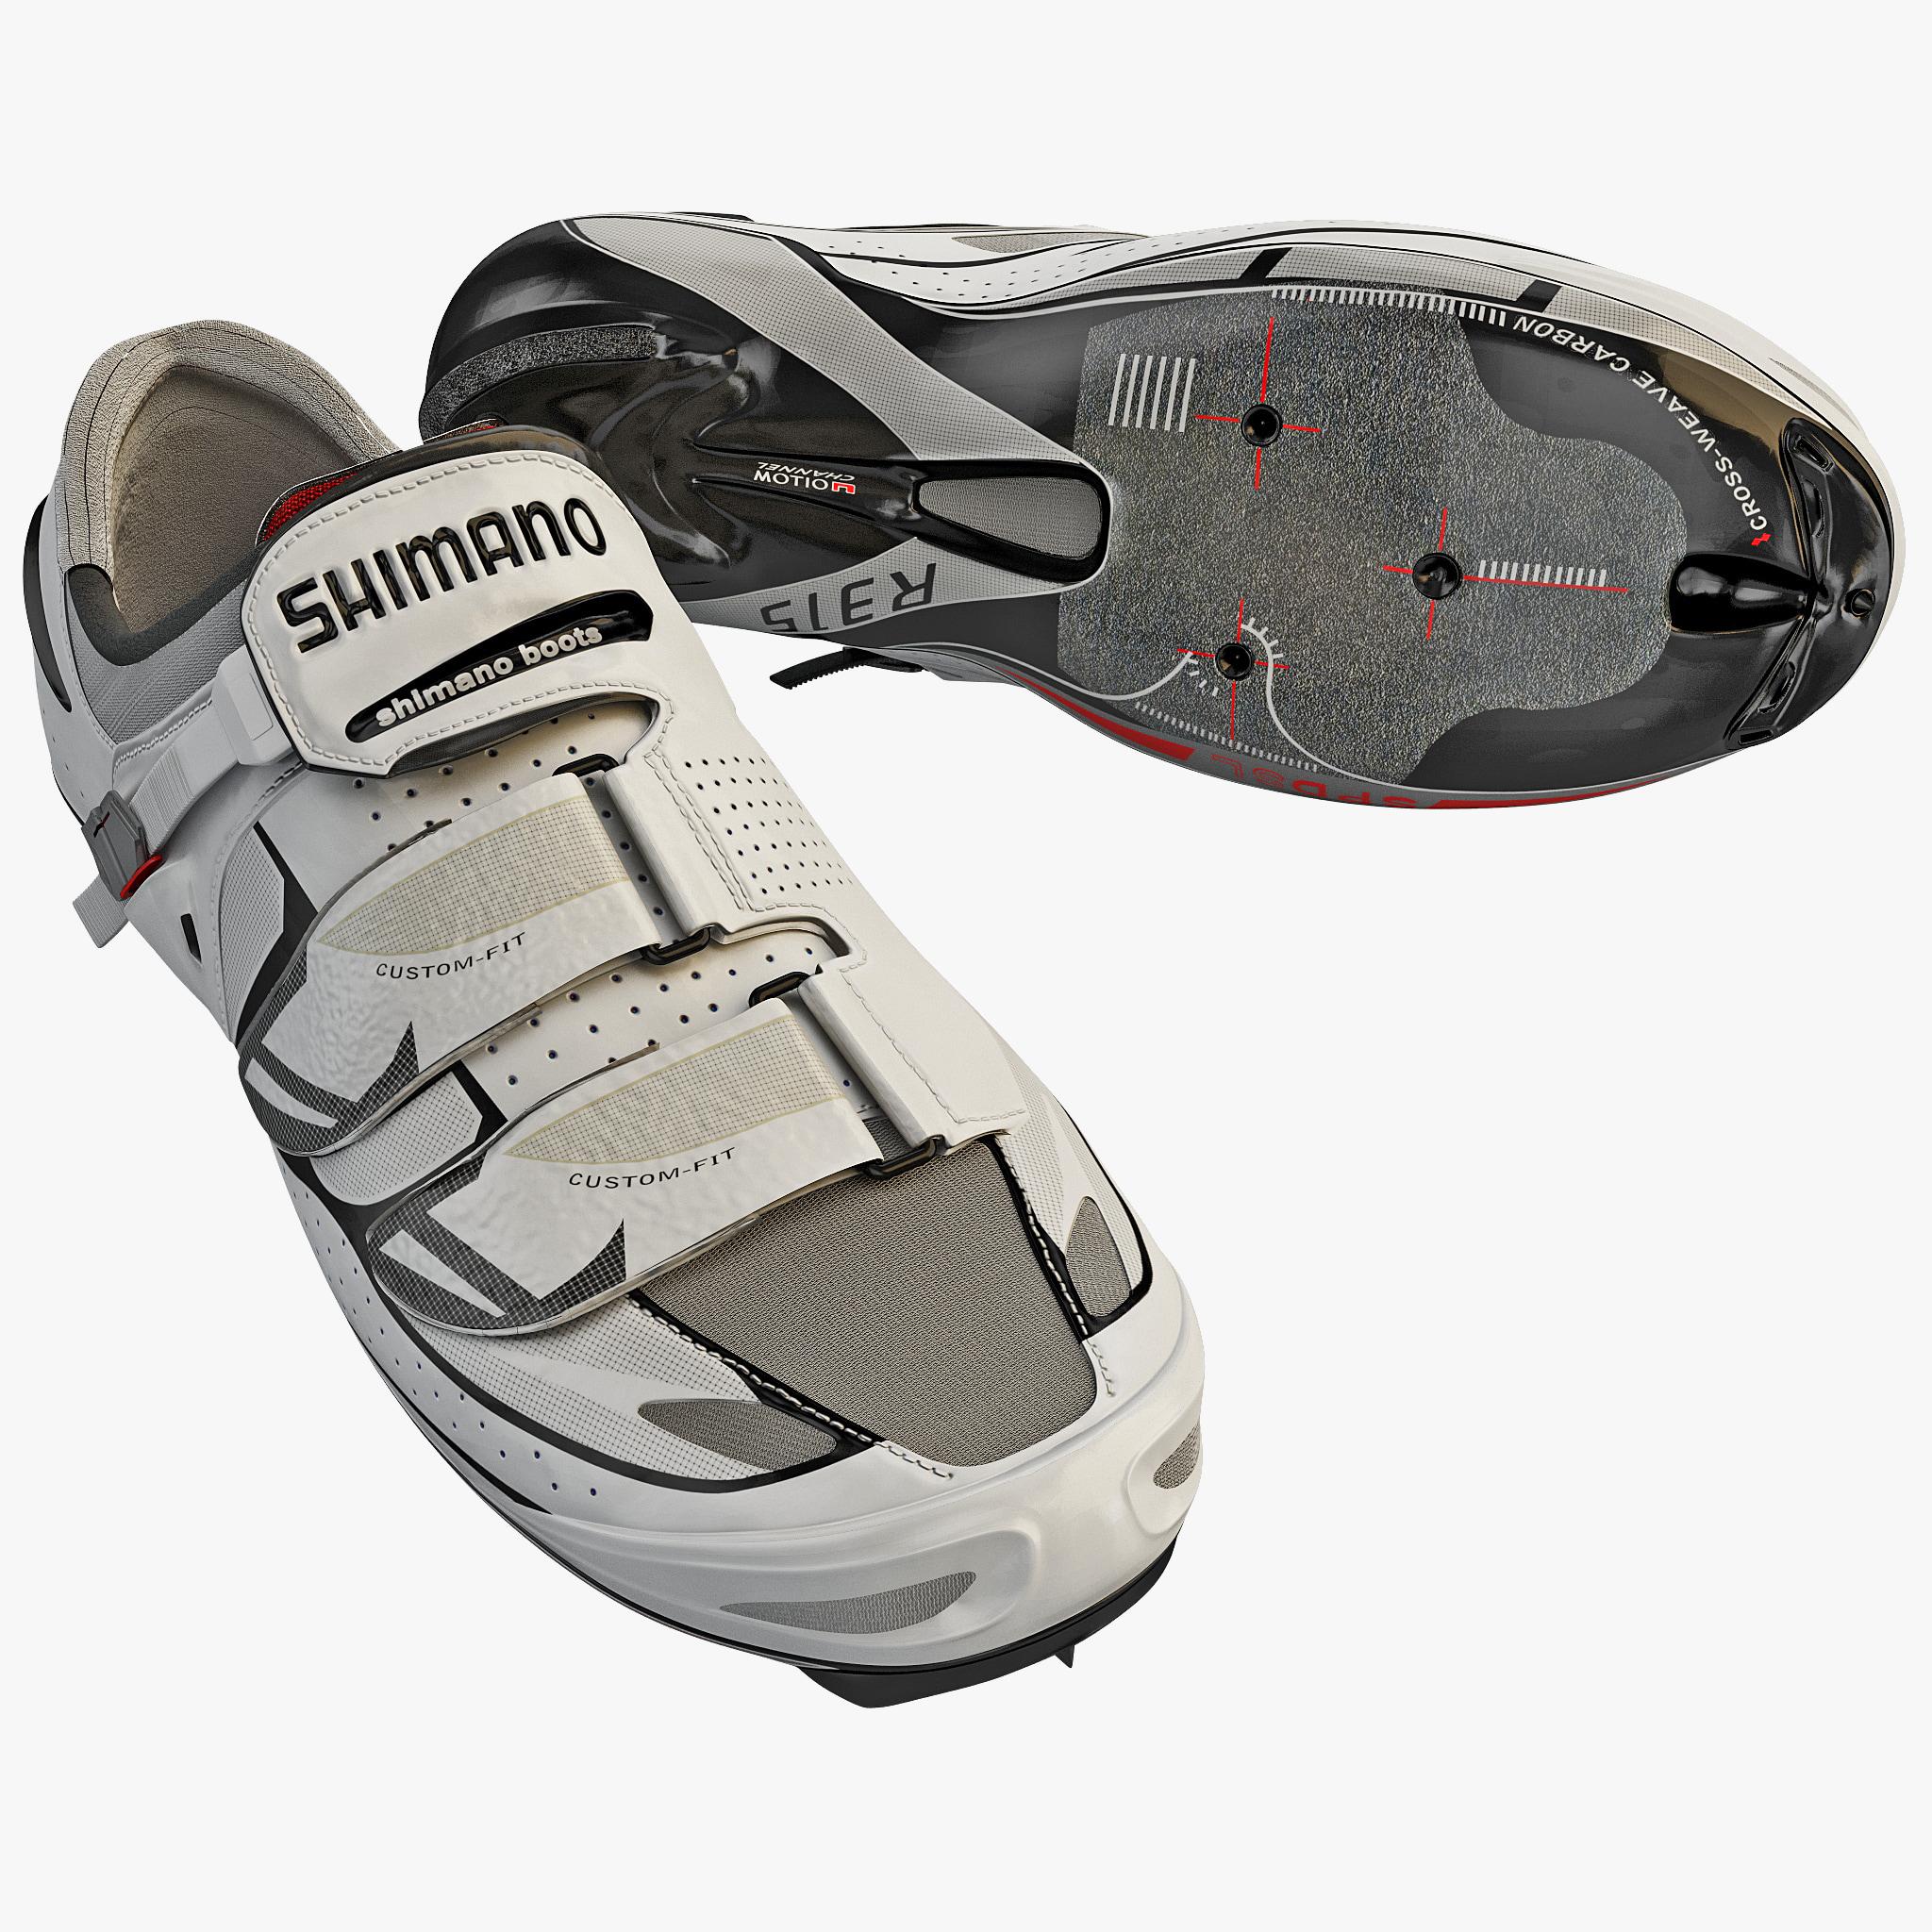 Road Bicycle Shoes Shimano_1.jpg